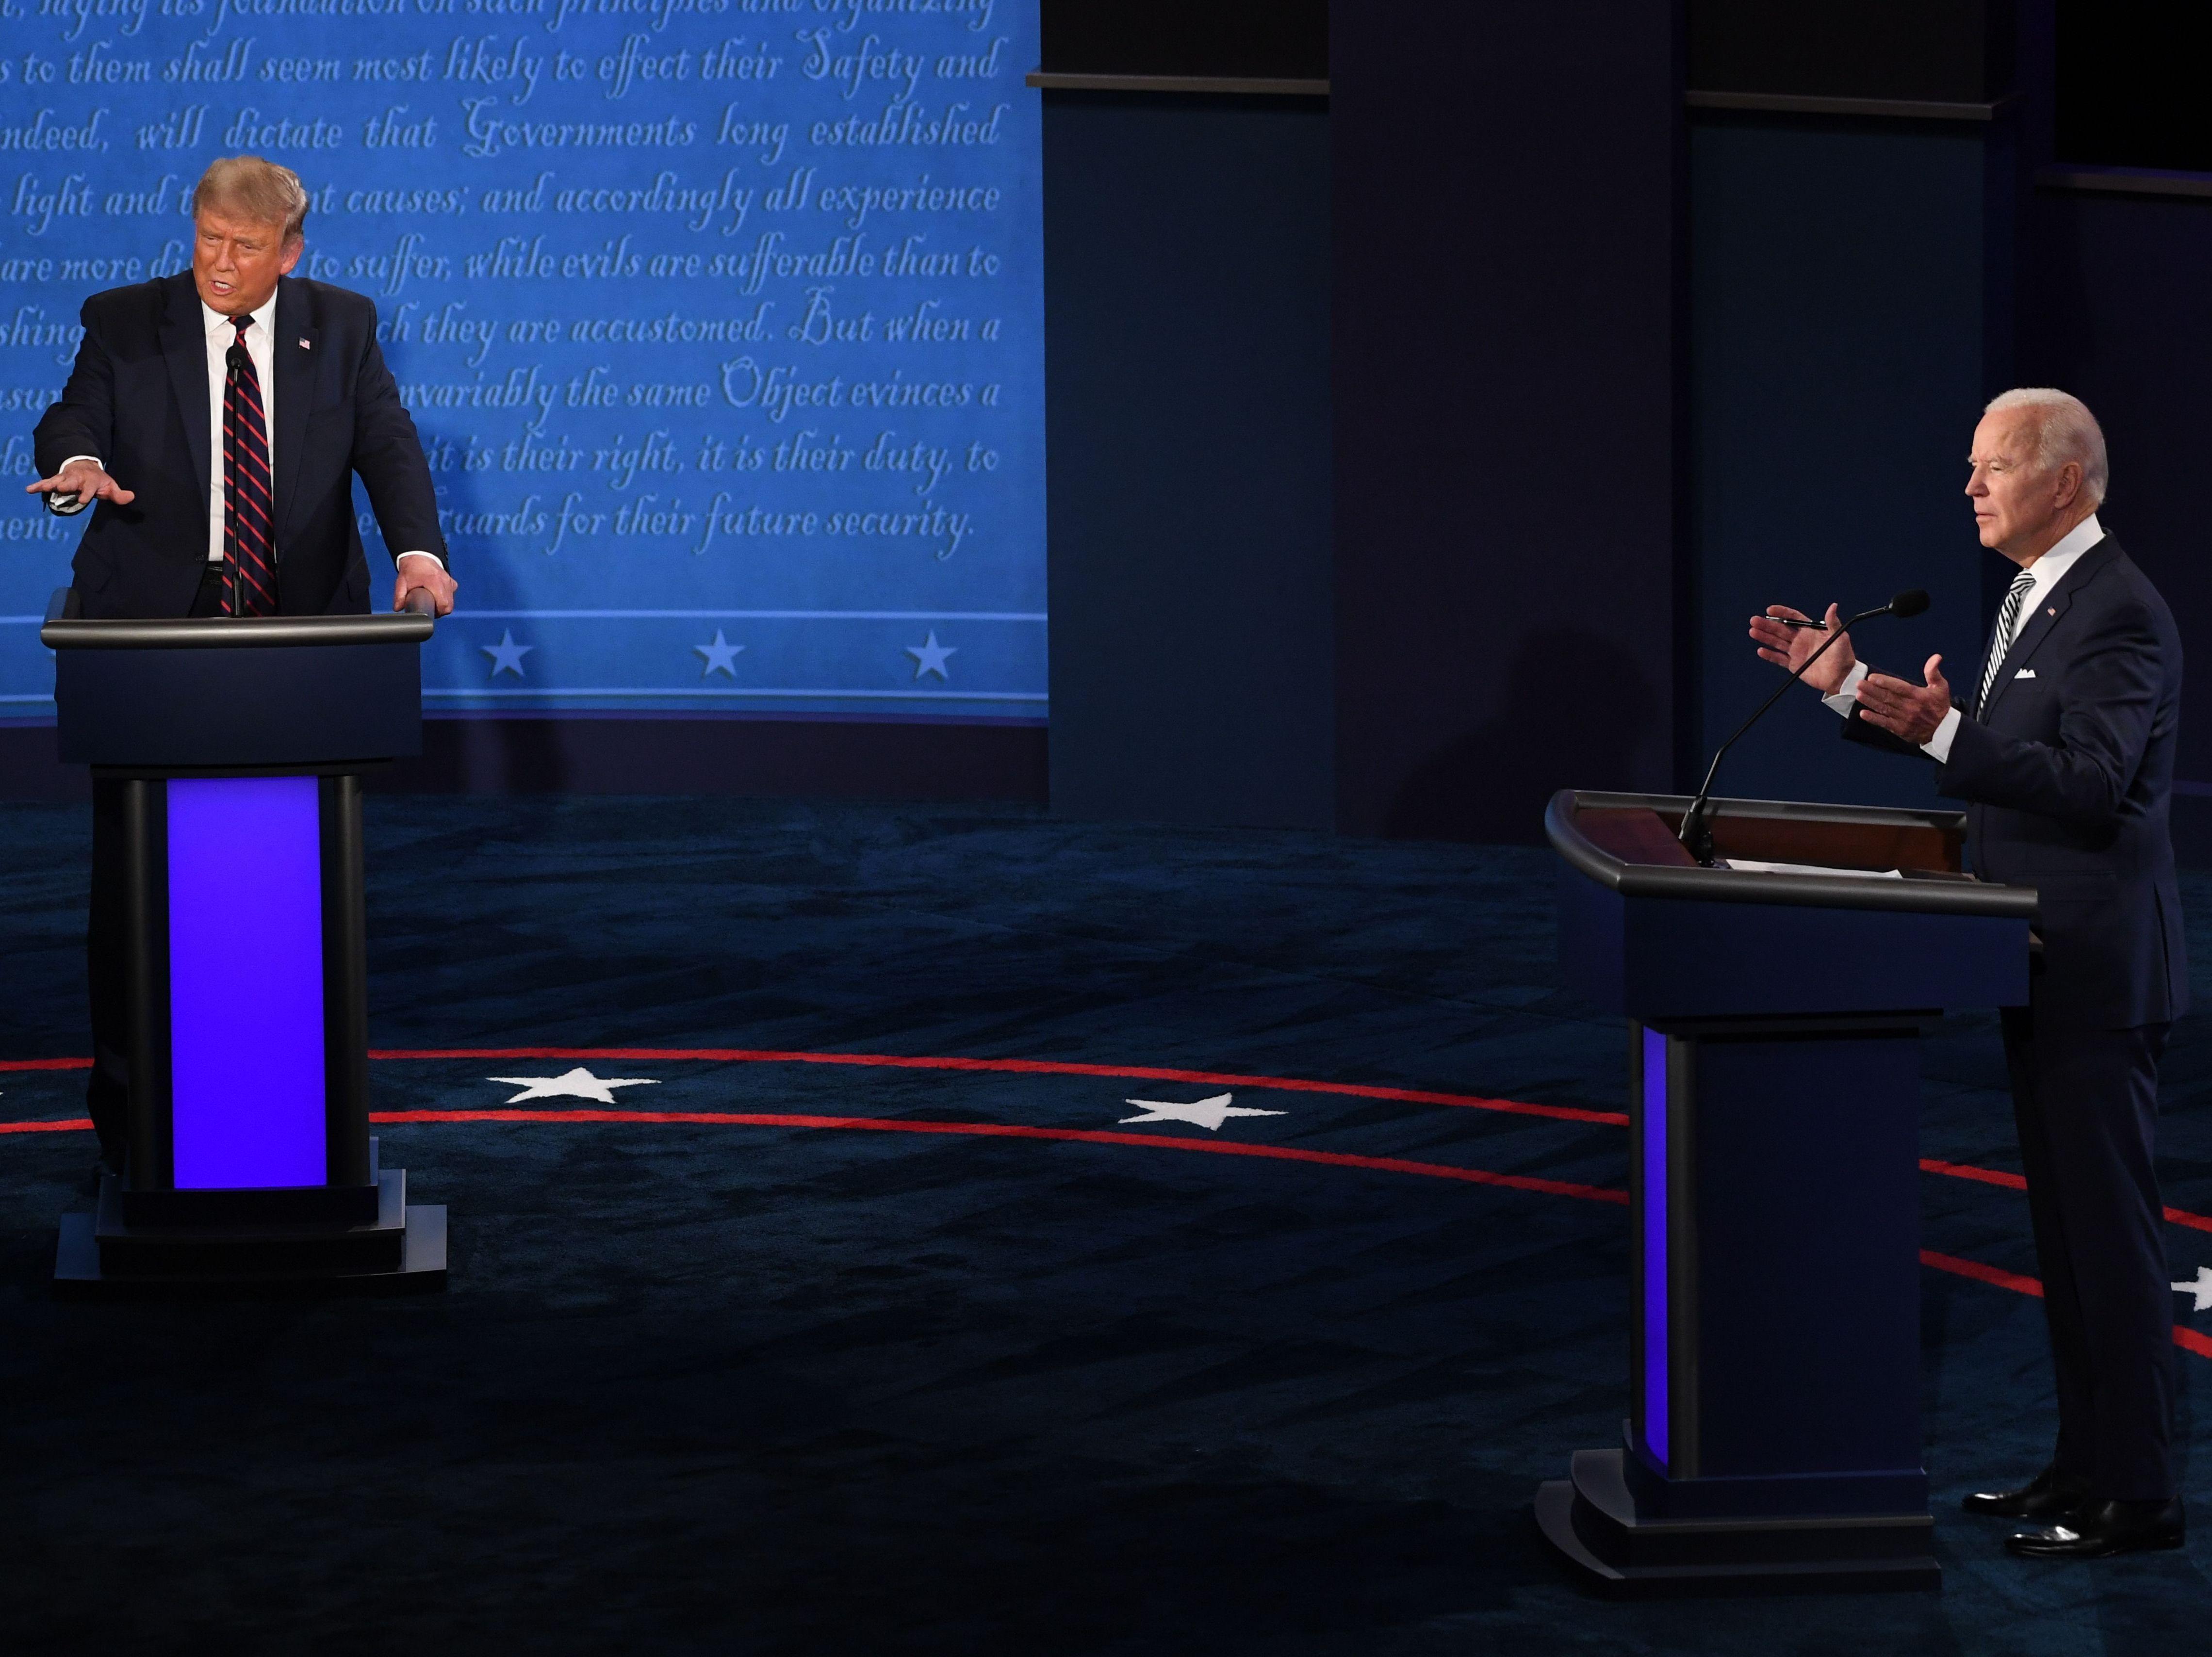 Presidential Debate Coverage Prompts Existential Question Npr Public Editor Npr